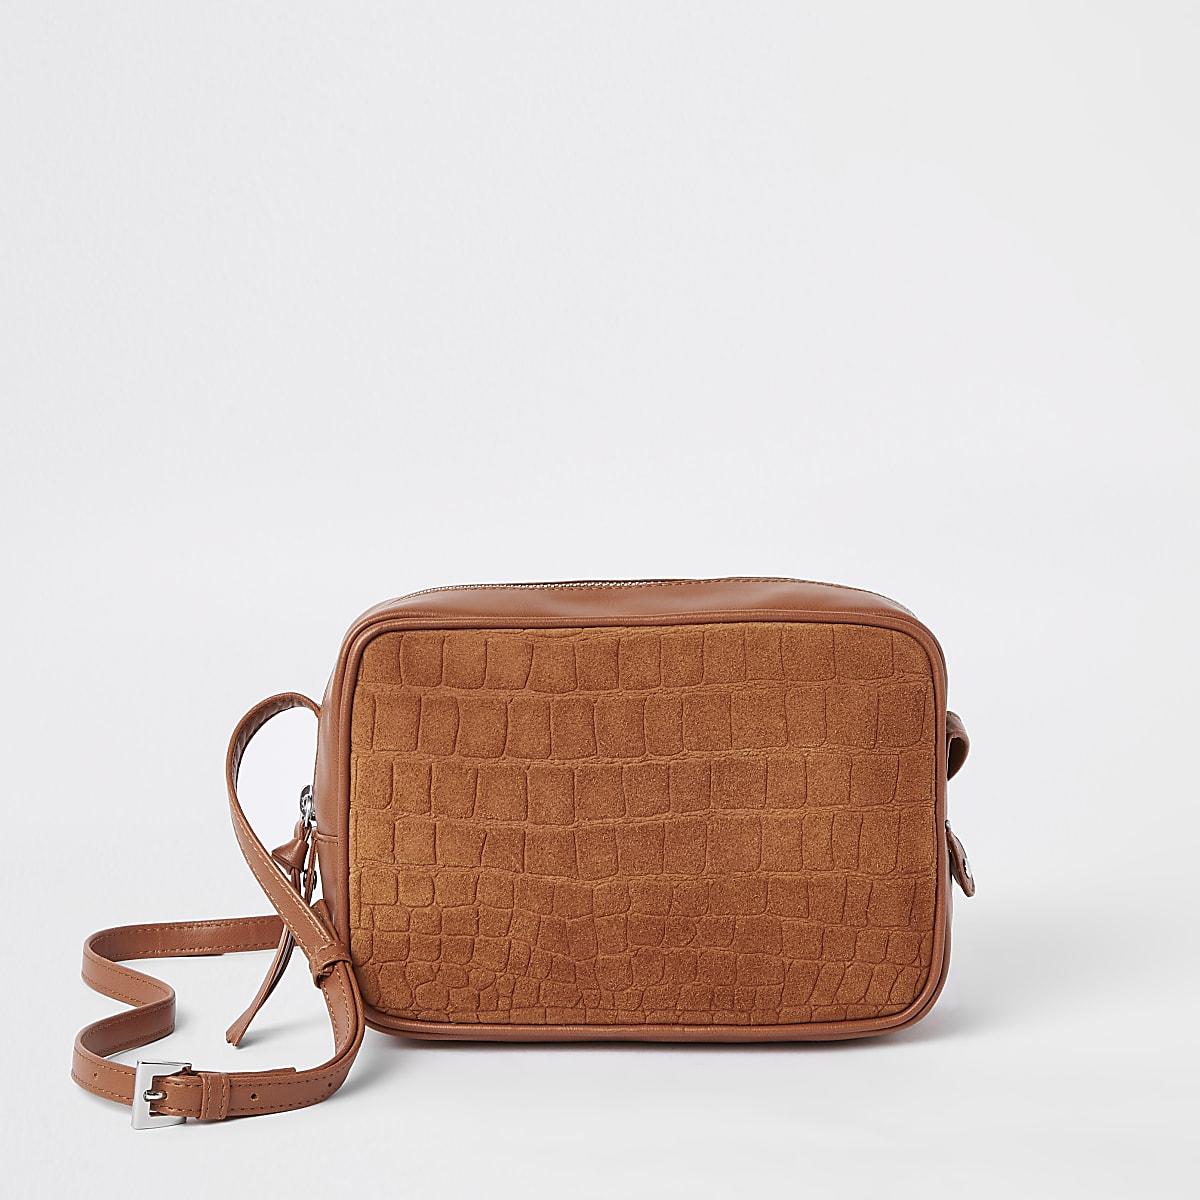 Beige croc leather cross body bag